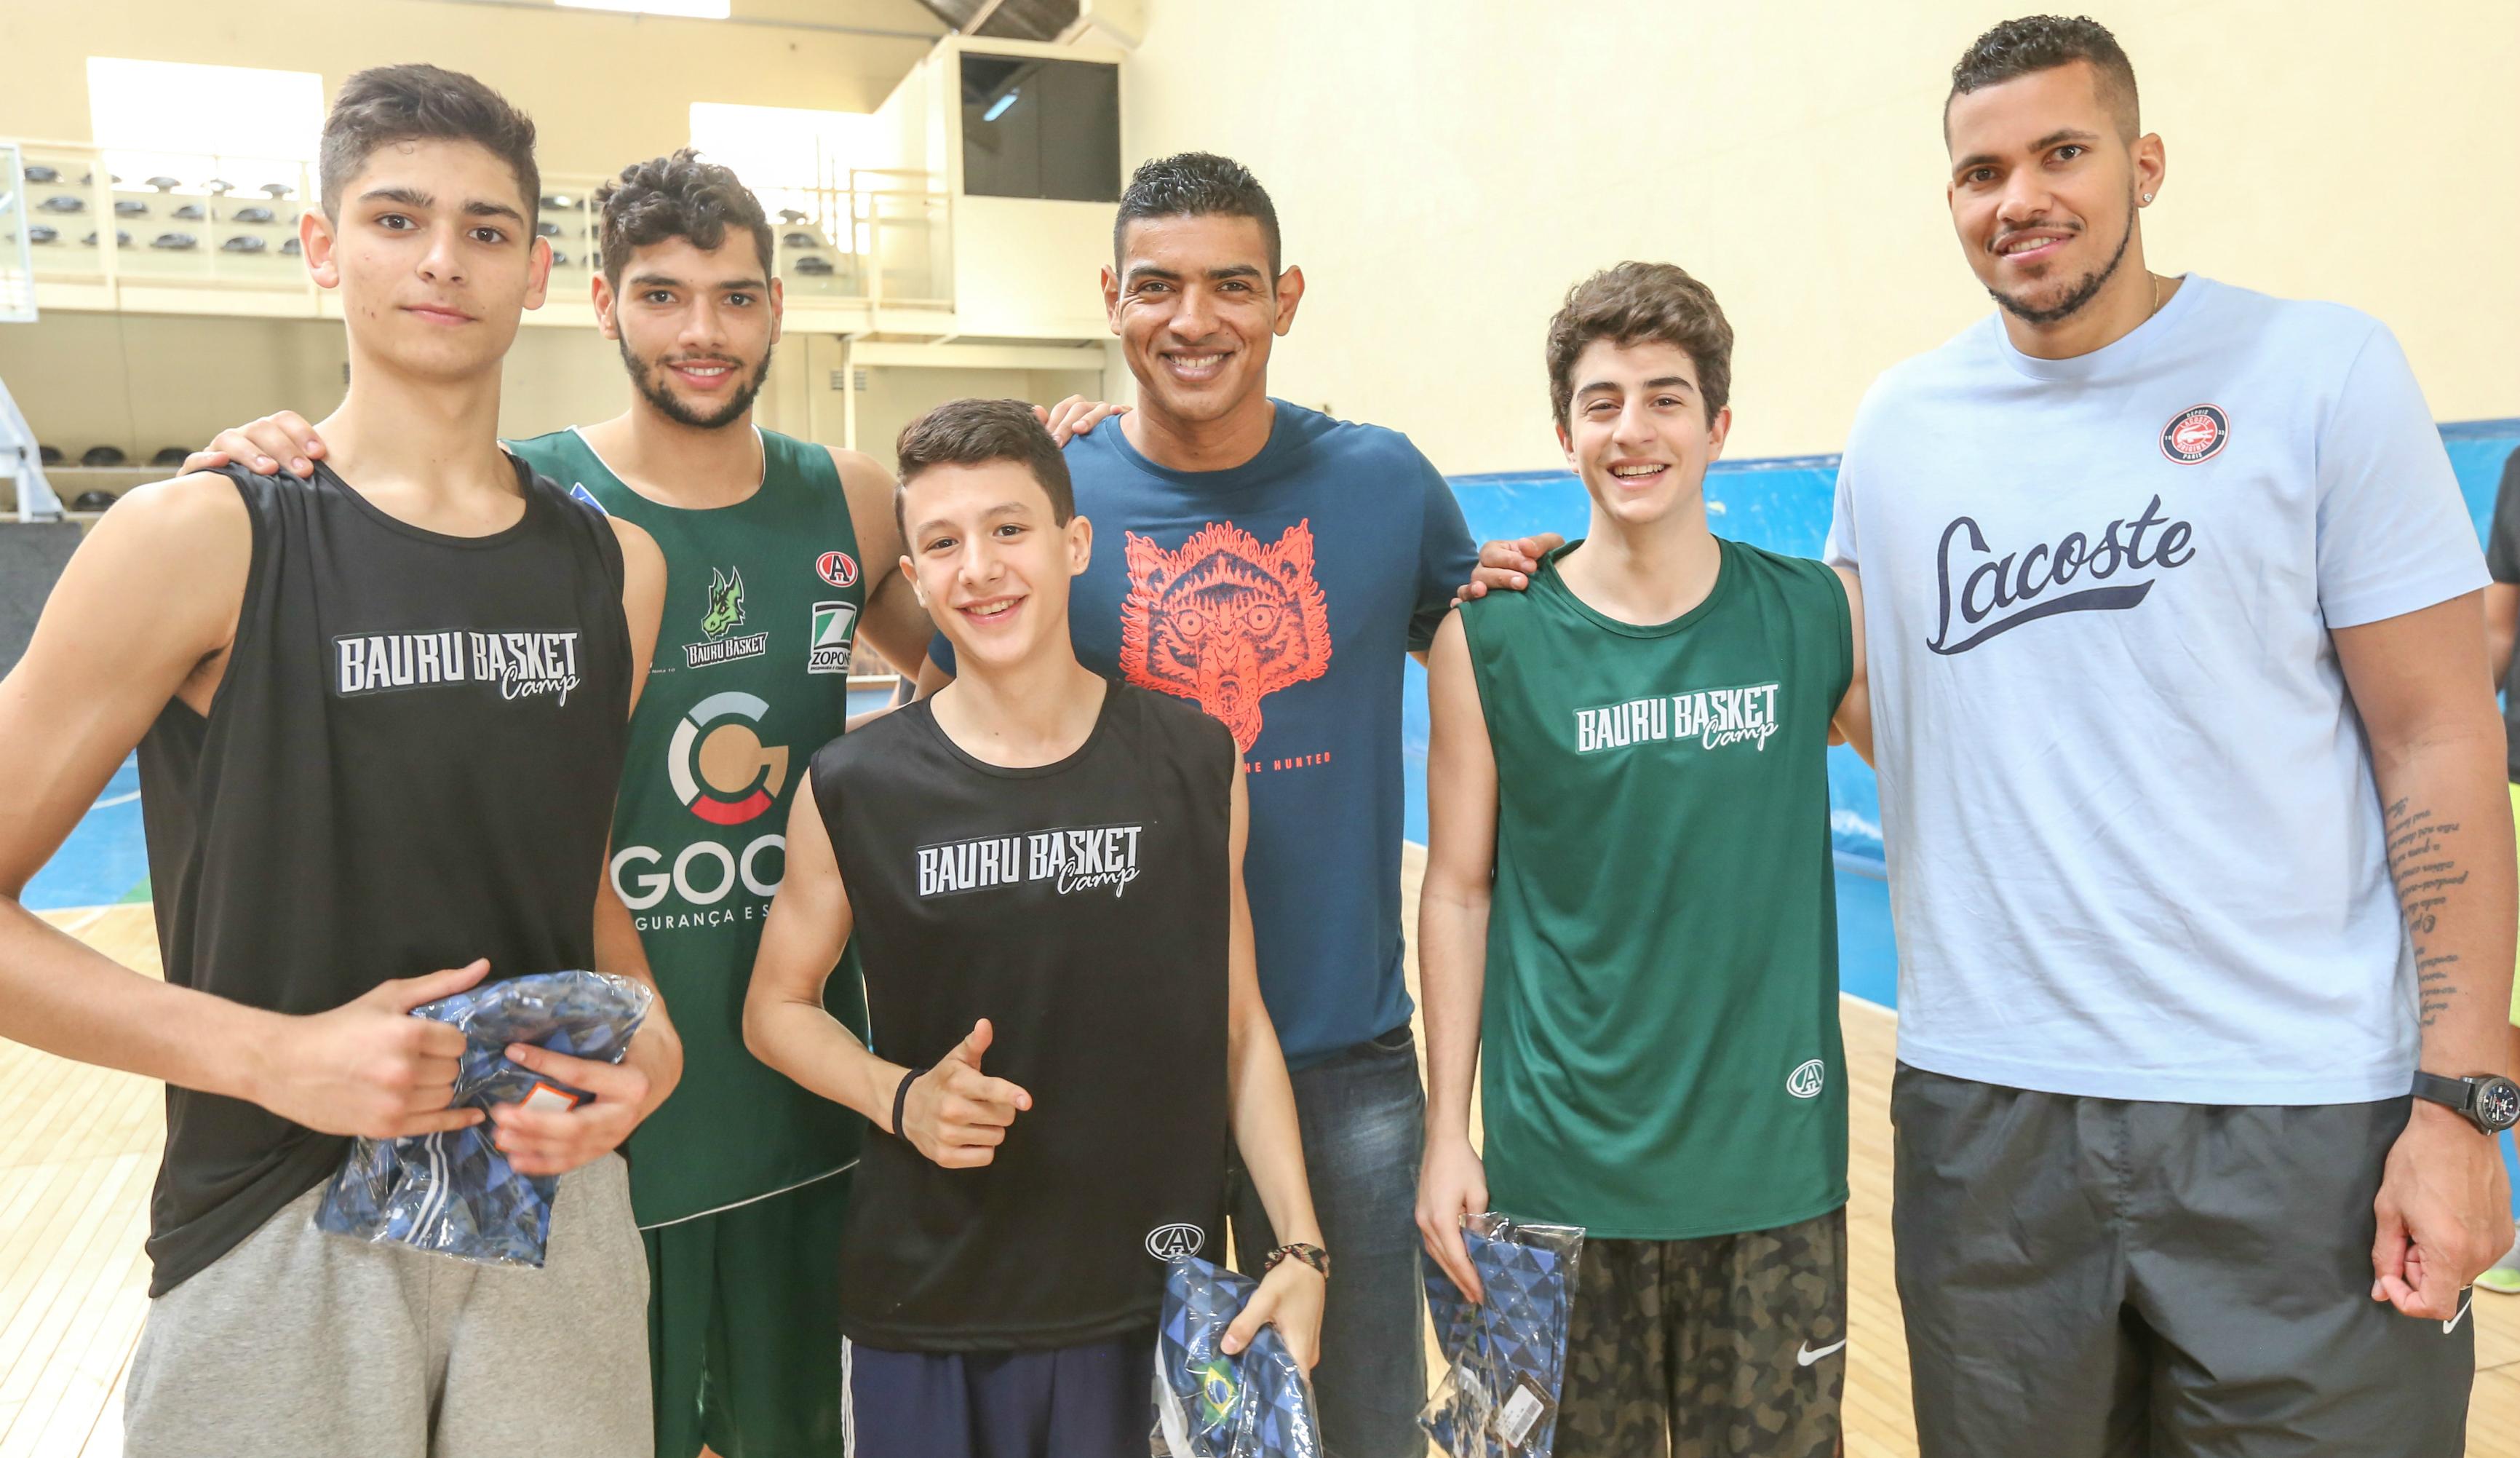 1º Bauru Basket Camp